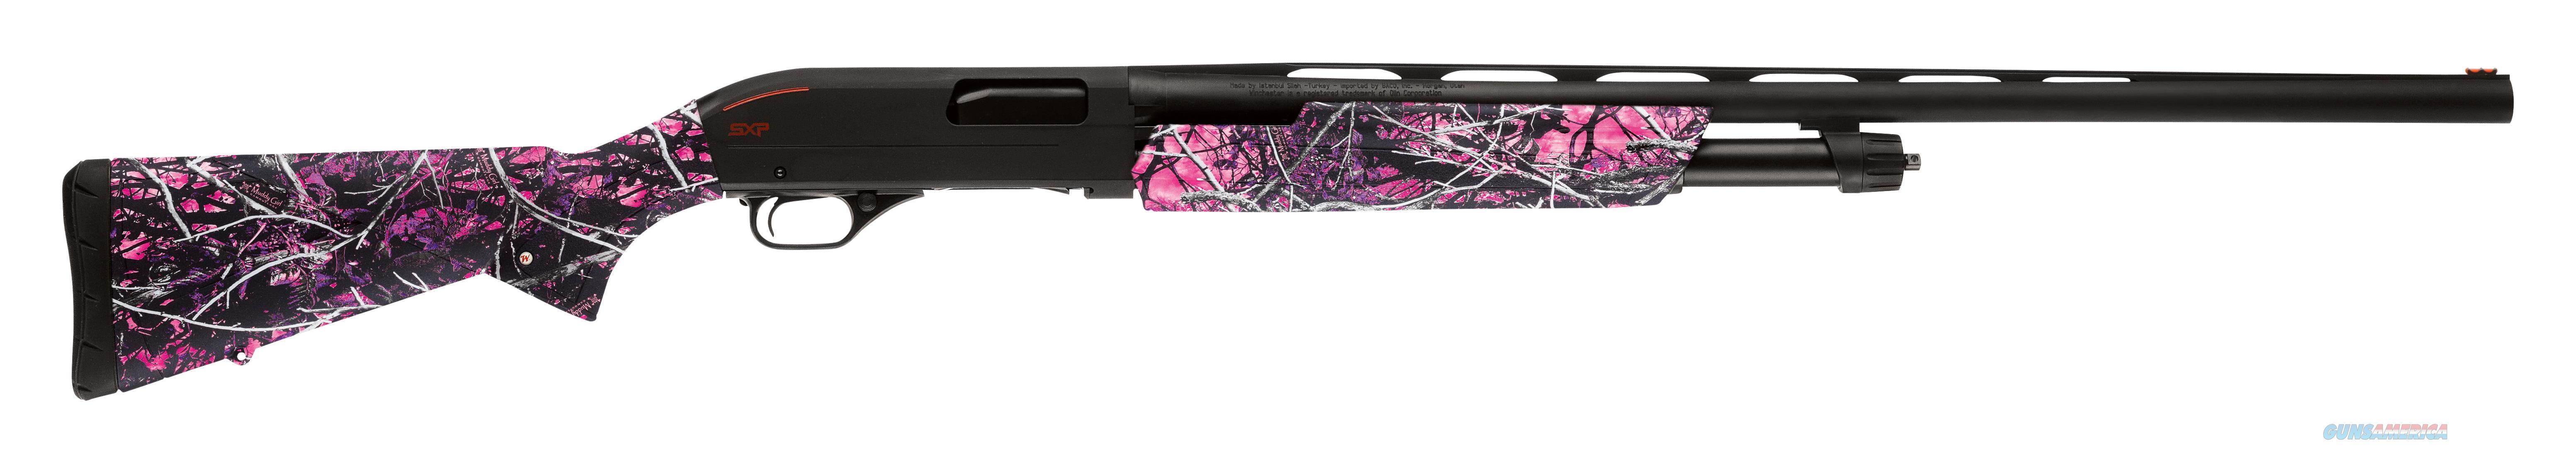 "Winchester Super-Xp Comp Fld 20Ga 3"" 28""Vr Inv+3 M.Black/Muddy Gir< 512325692  Guns > Shotguns > W Misc Shotguns"